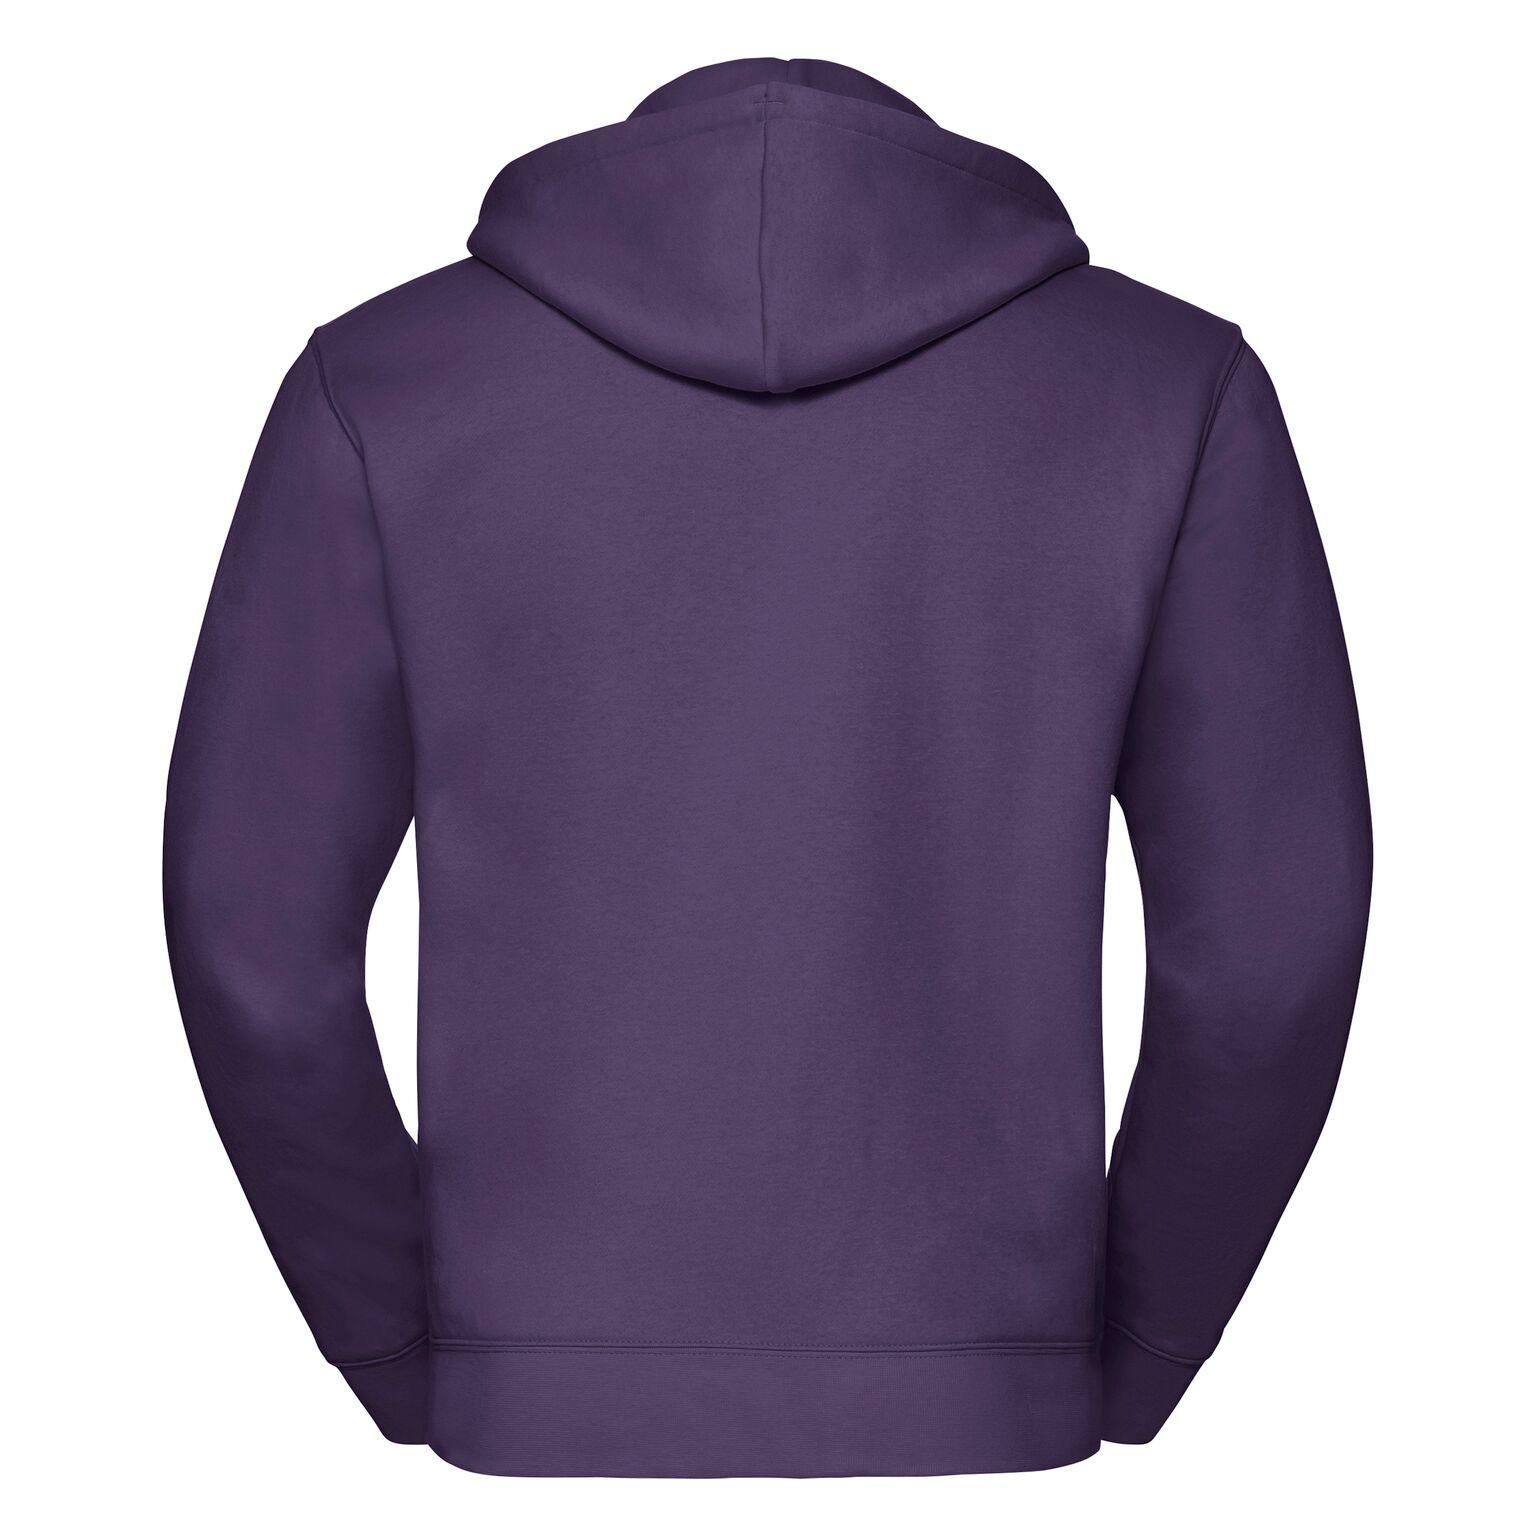 05_j266m_violet--0-0--68eb8316-dbb2-4060-abd5-b79bcc1f3a59